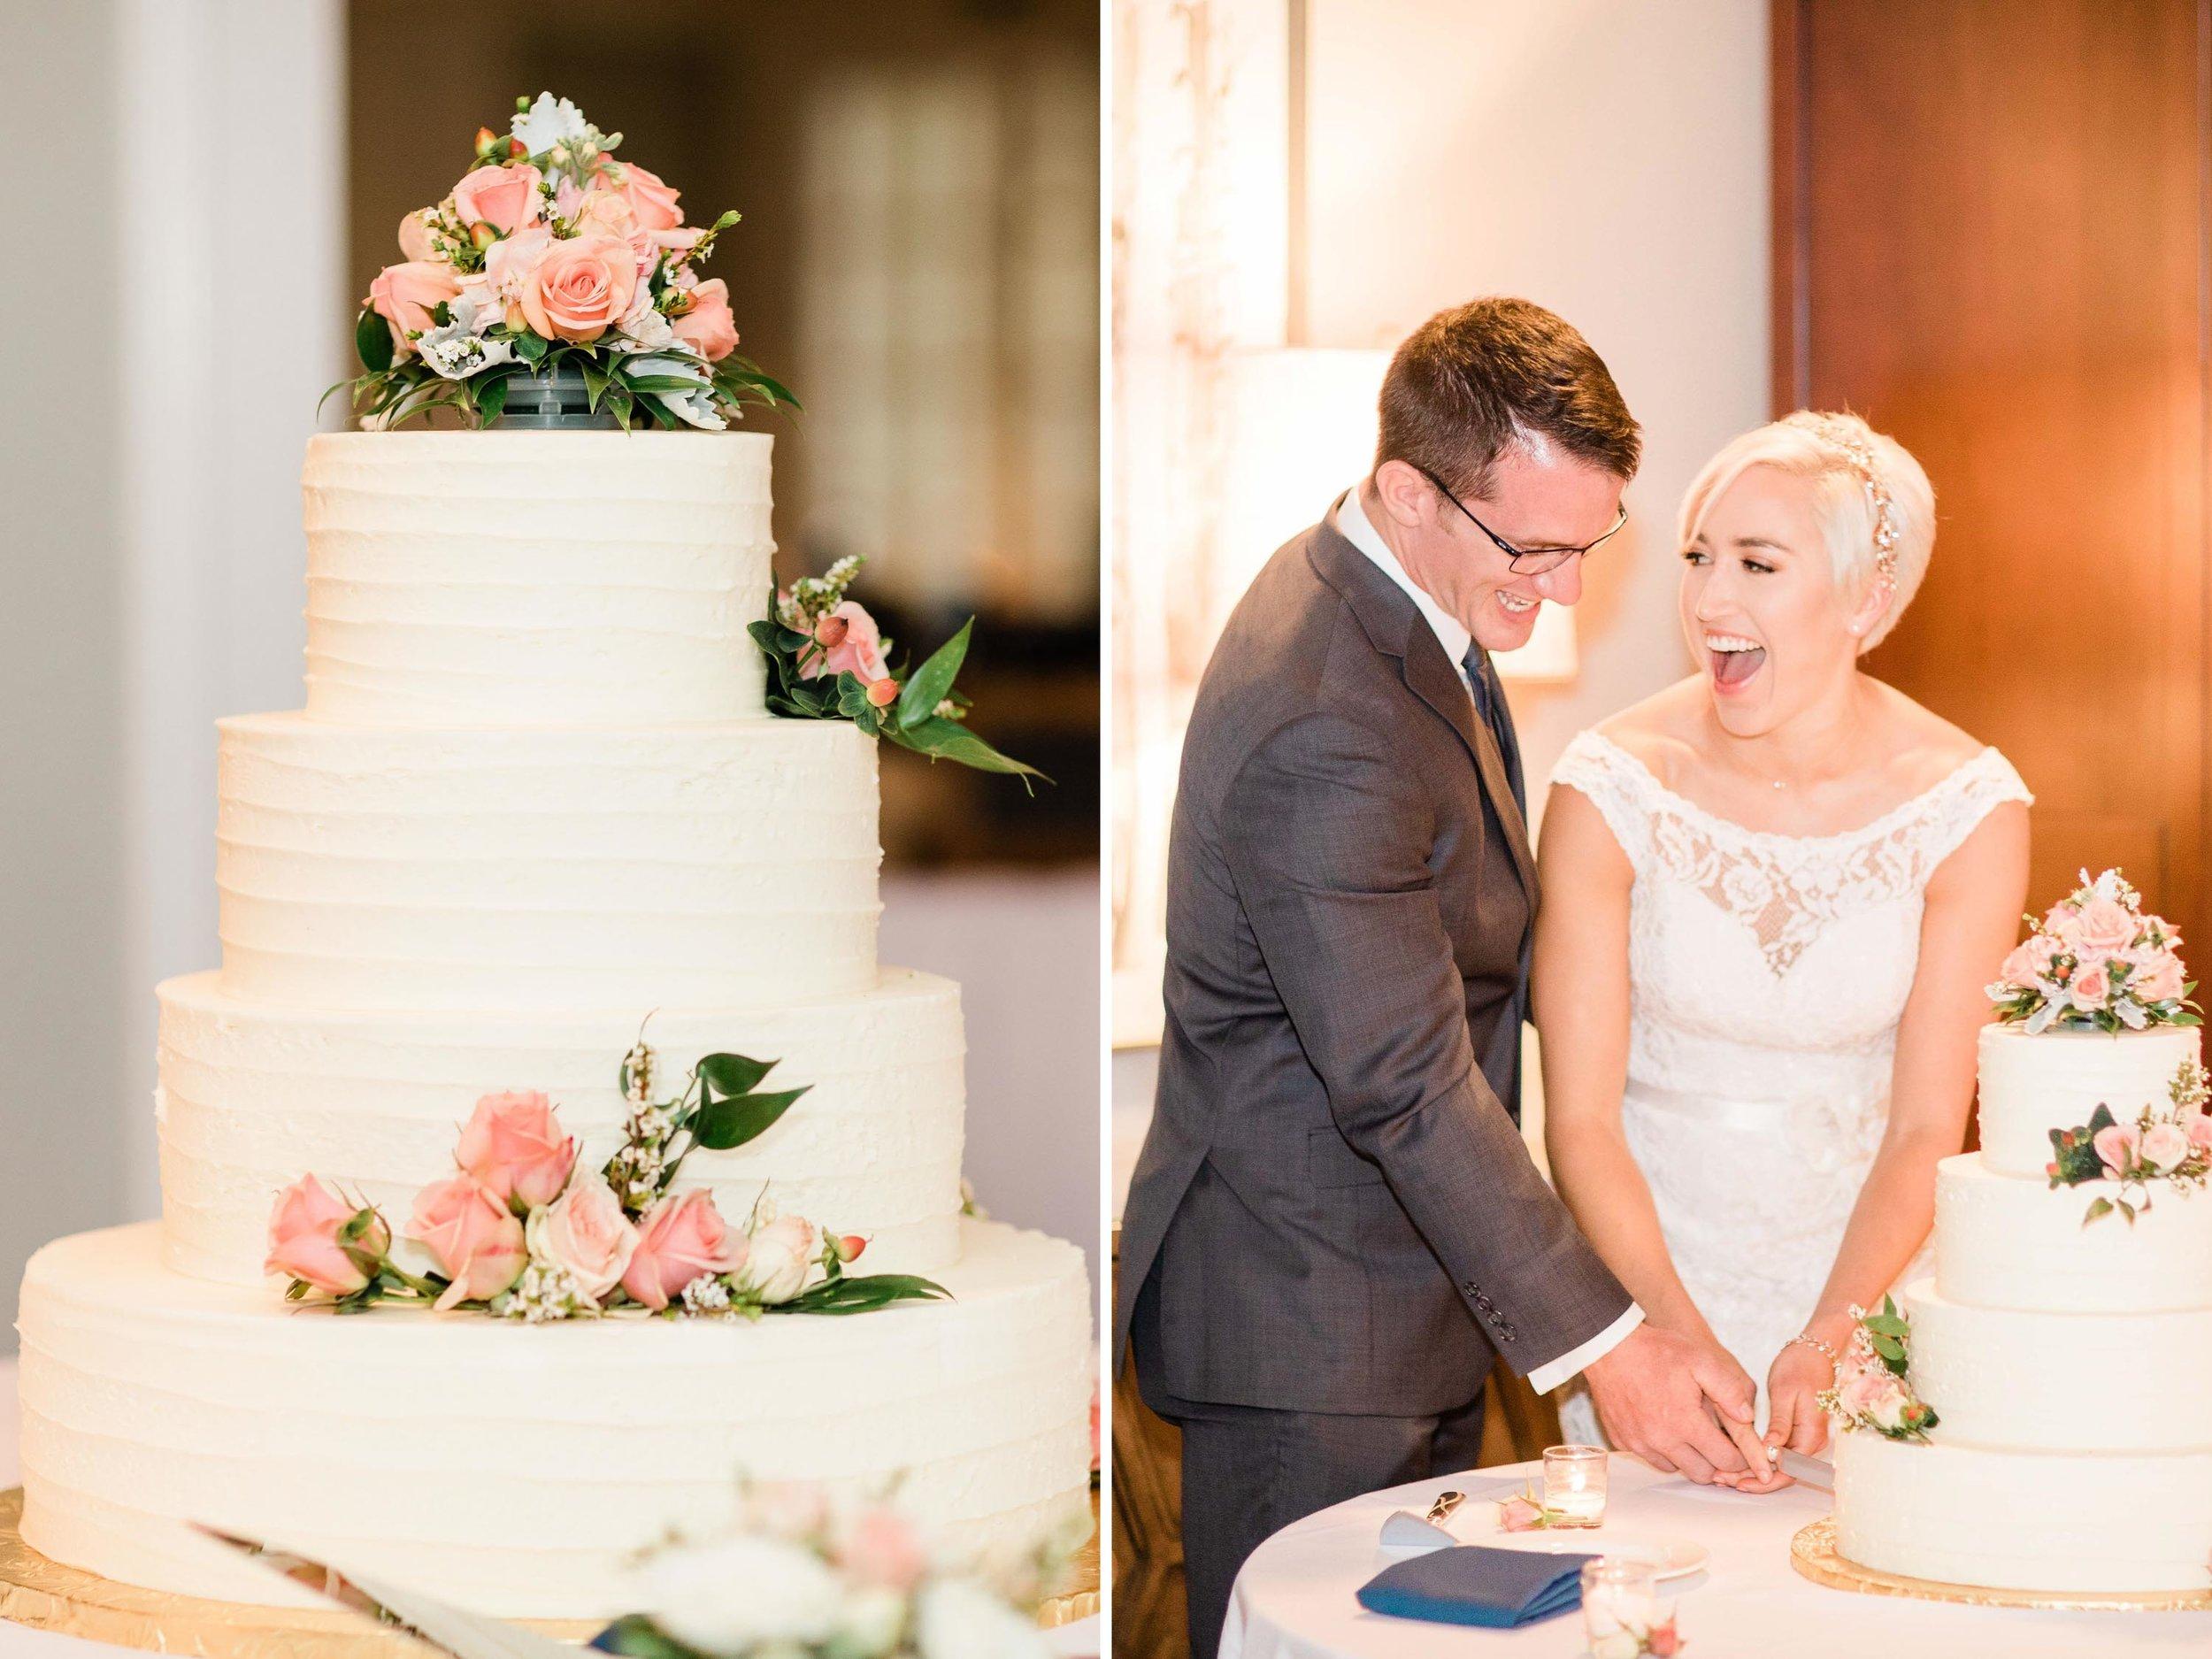 wedding cake cutting photos.jpg